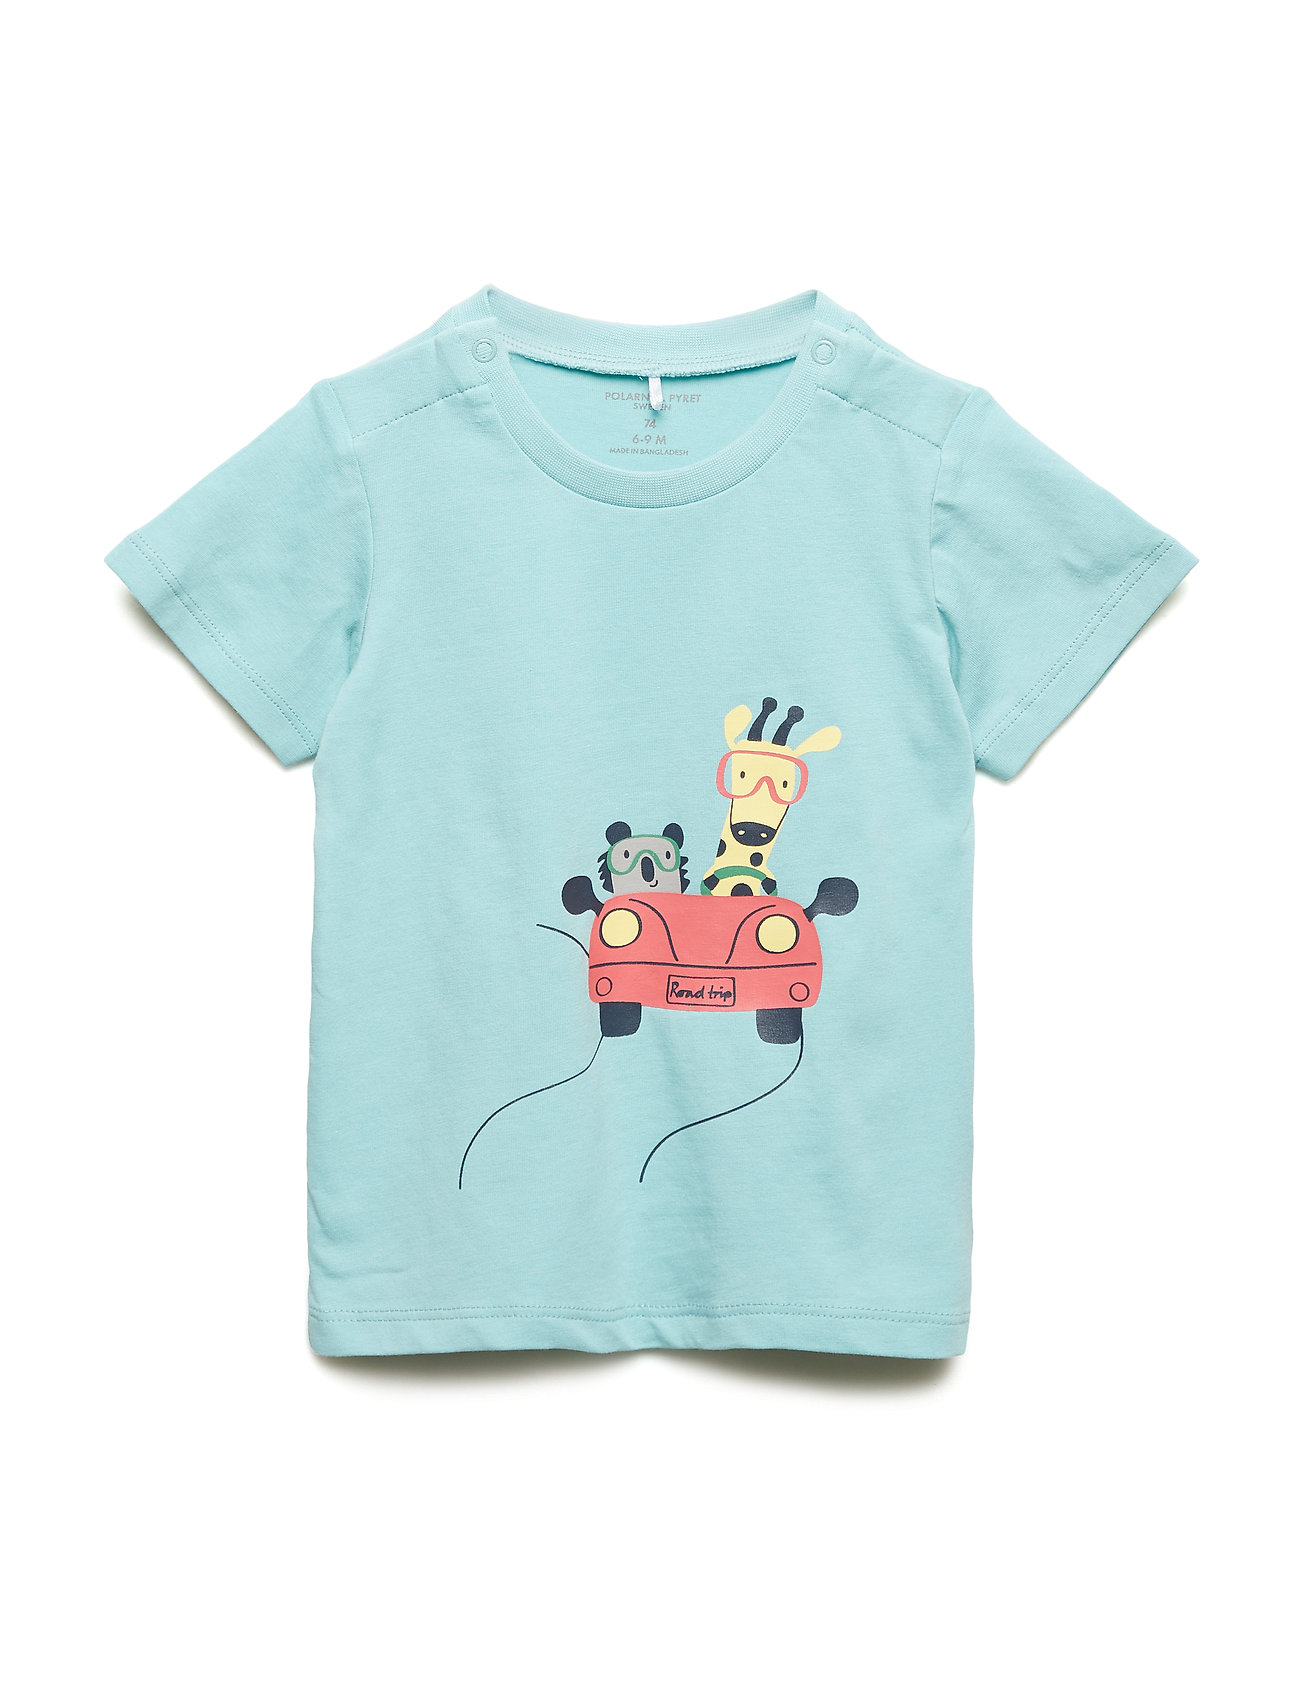 Polarn O. Pyret T-shirt S/S Baby